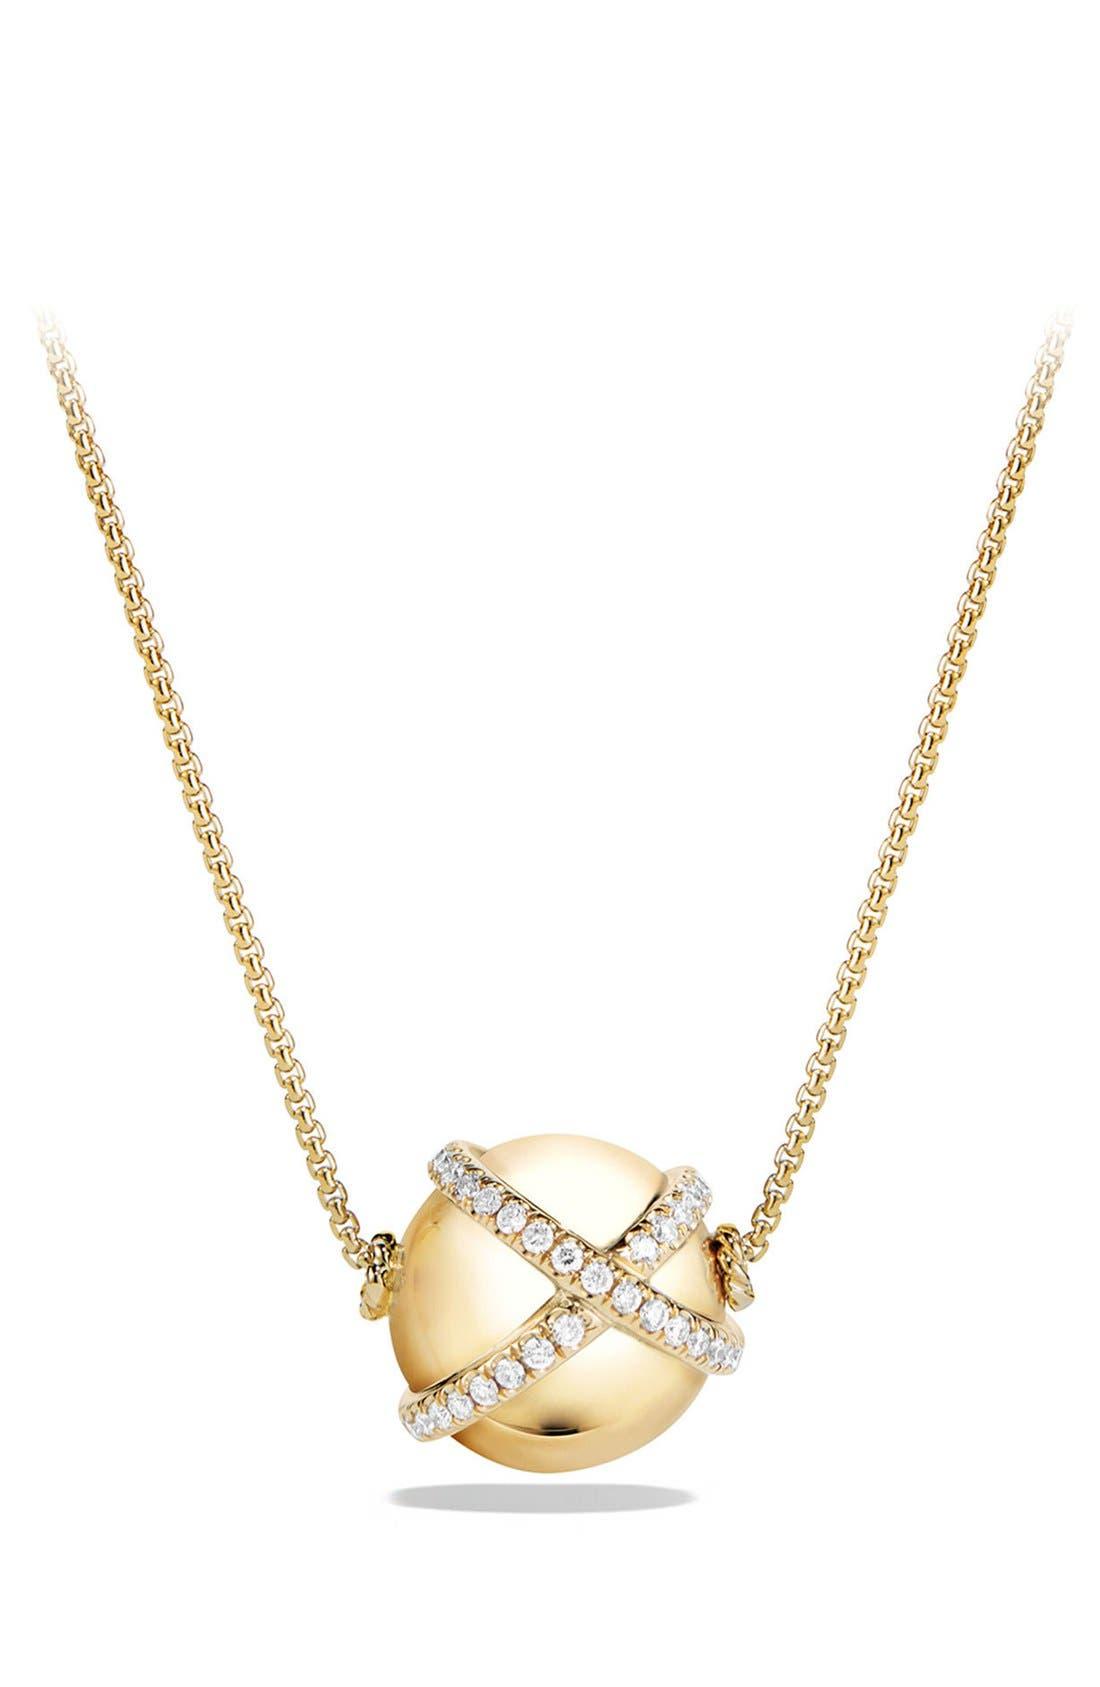 David Yurman 'Solari' Wrap Pendant Necklace with Pavé Diamonds in 18k Gold